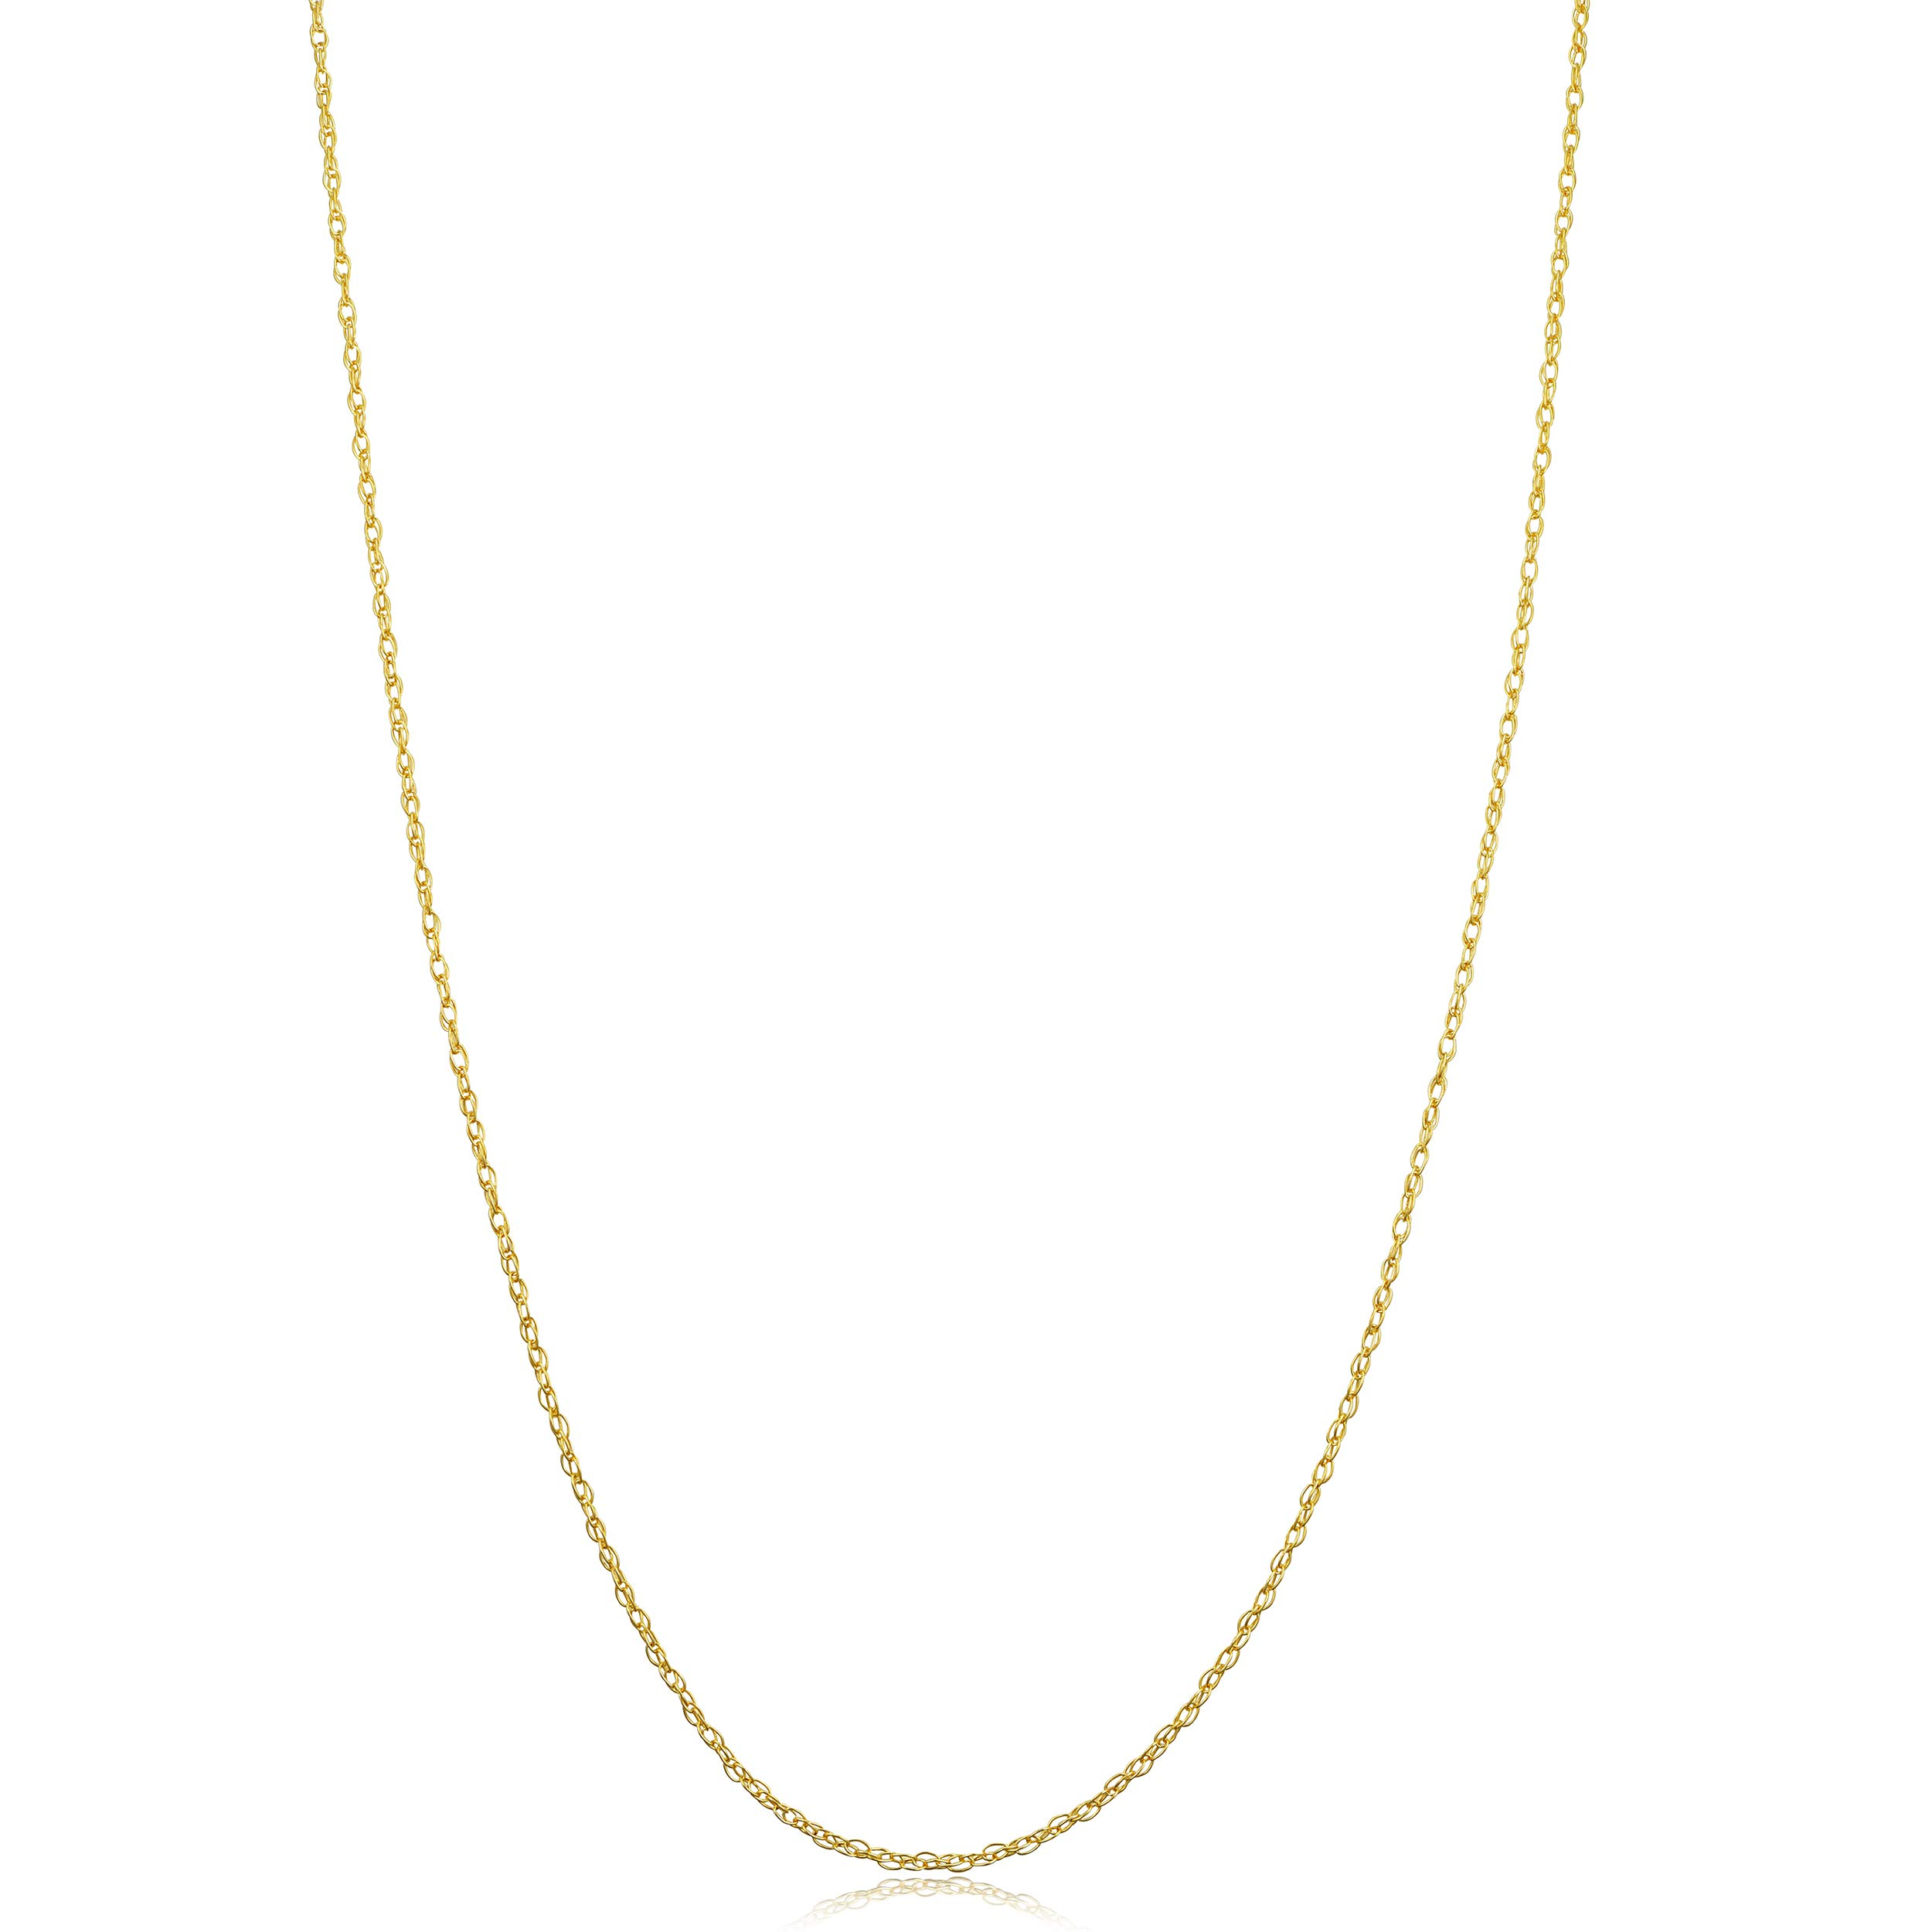 Kooljewelry Solid 14k Yellow Gold Rope Chain Necklace (20 inch, 0.9 mm wide) by Kooljewelry